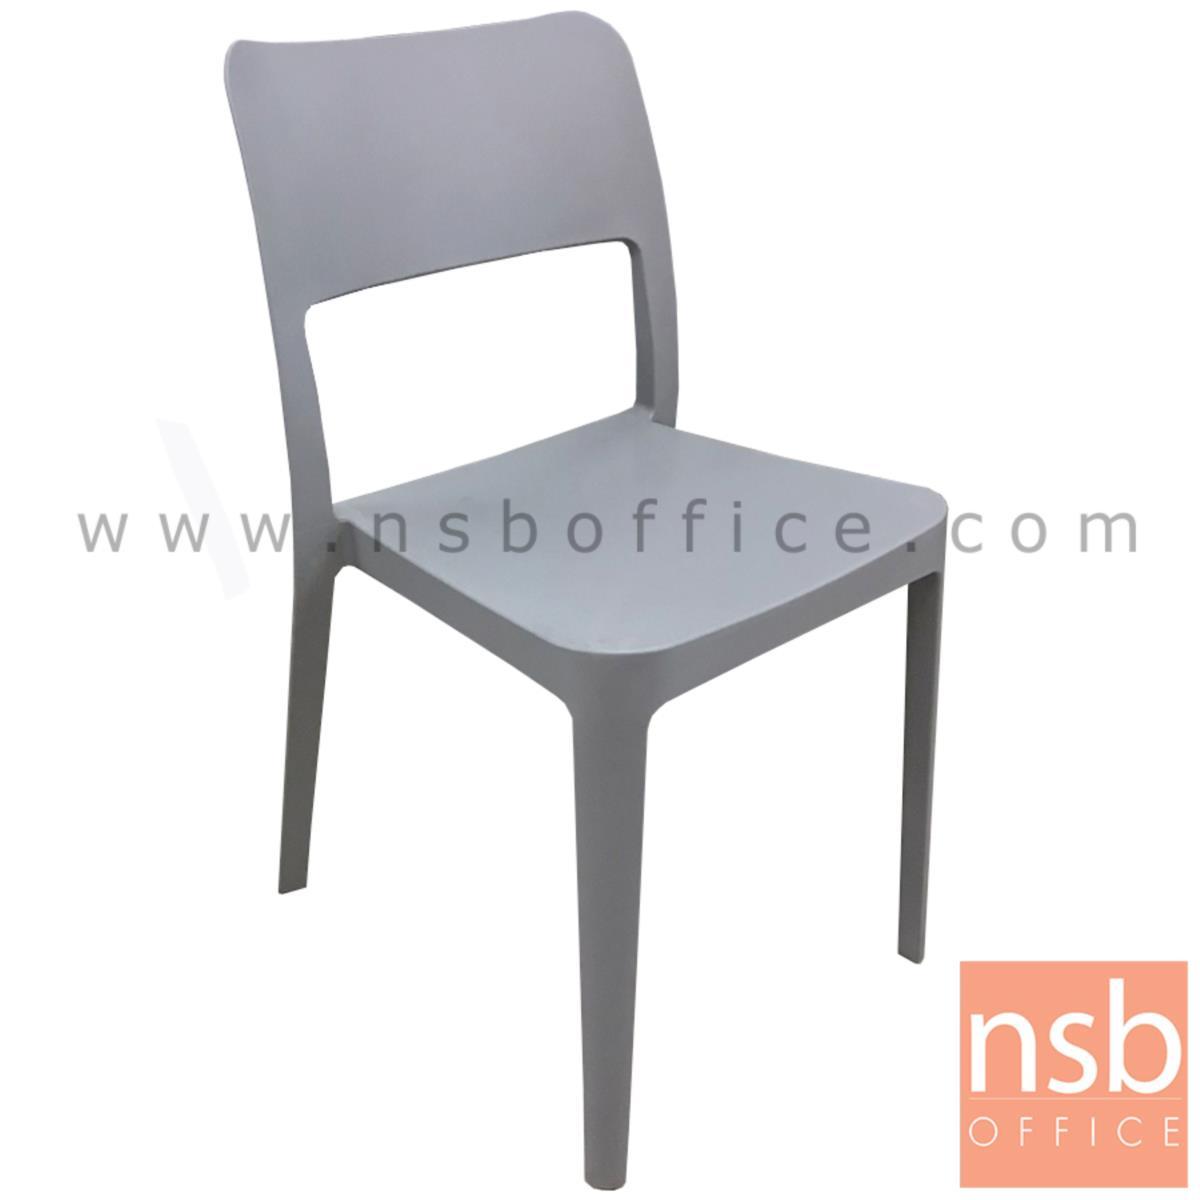 L02A343:เก้าอี้โมเดิร์น  ขนาด W cm. ขาพลาสติก